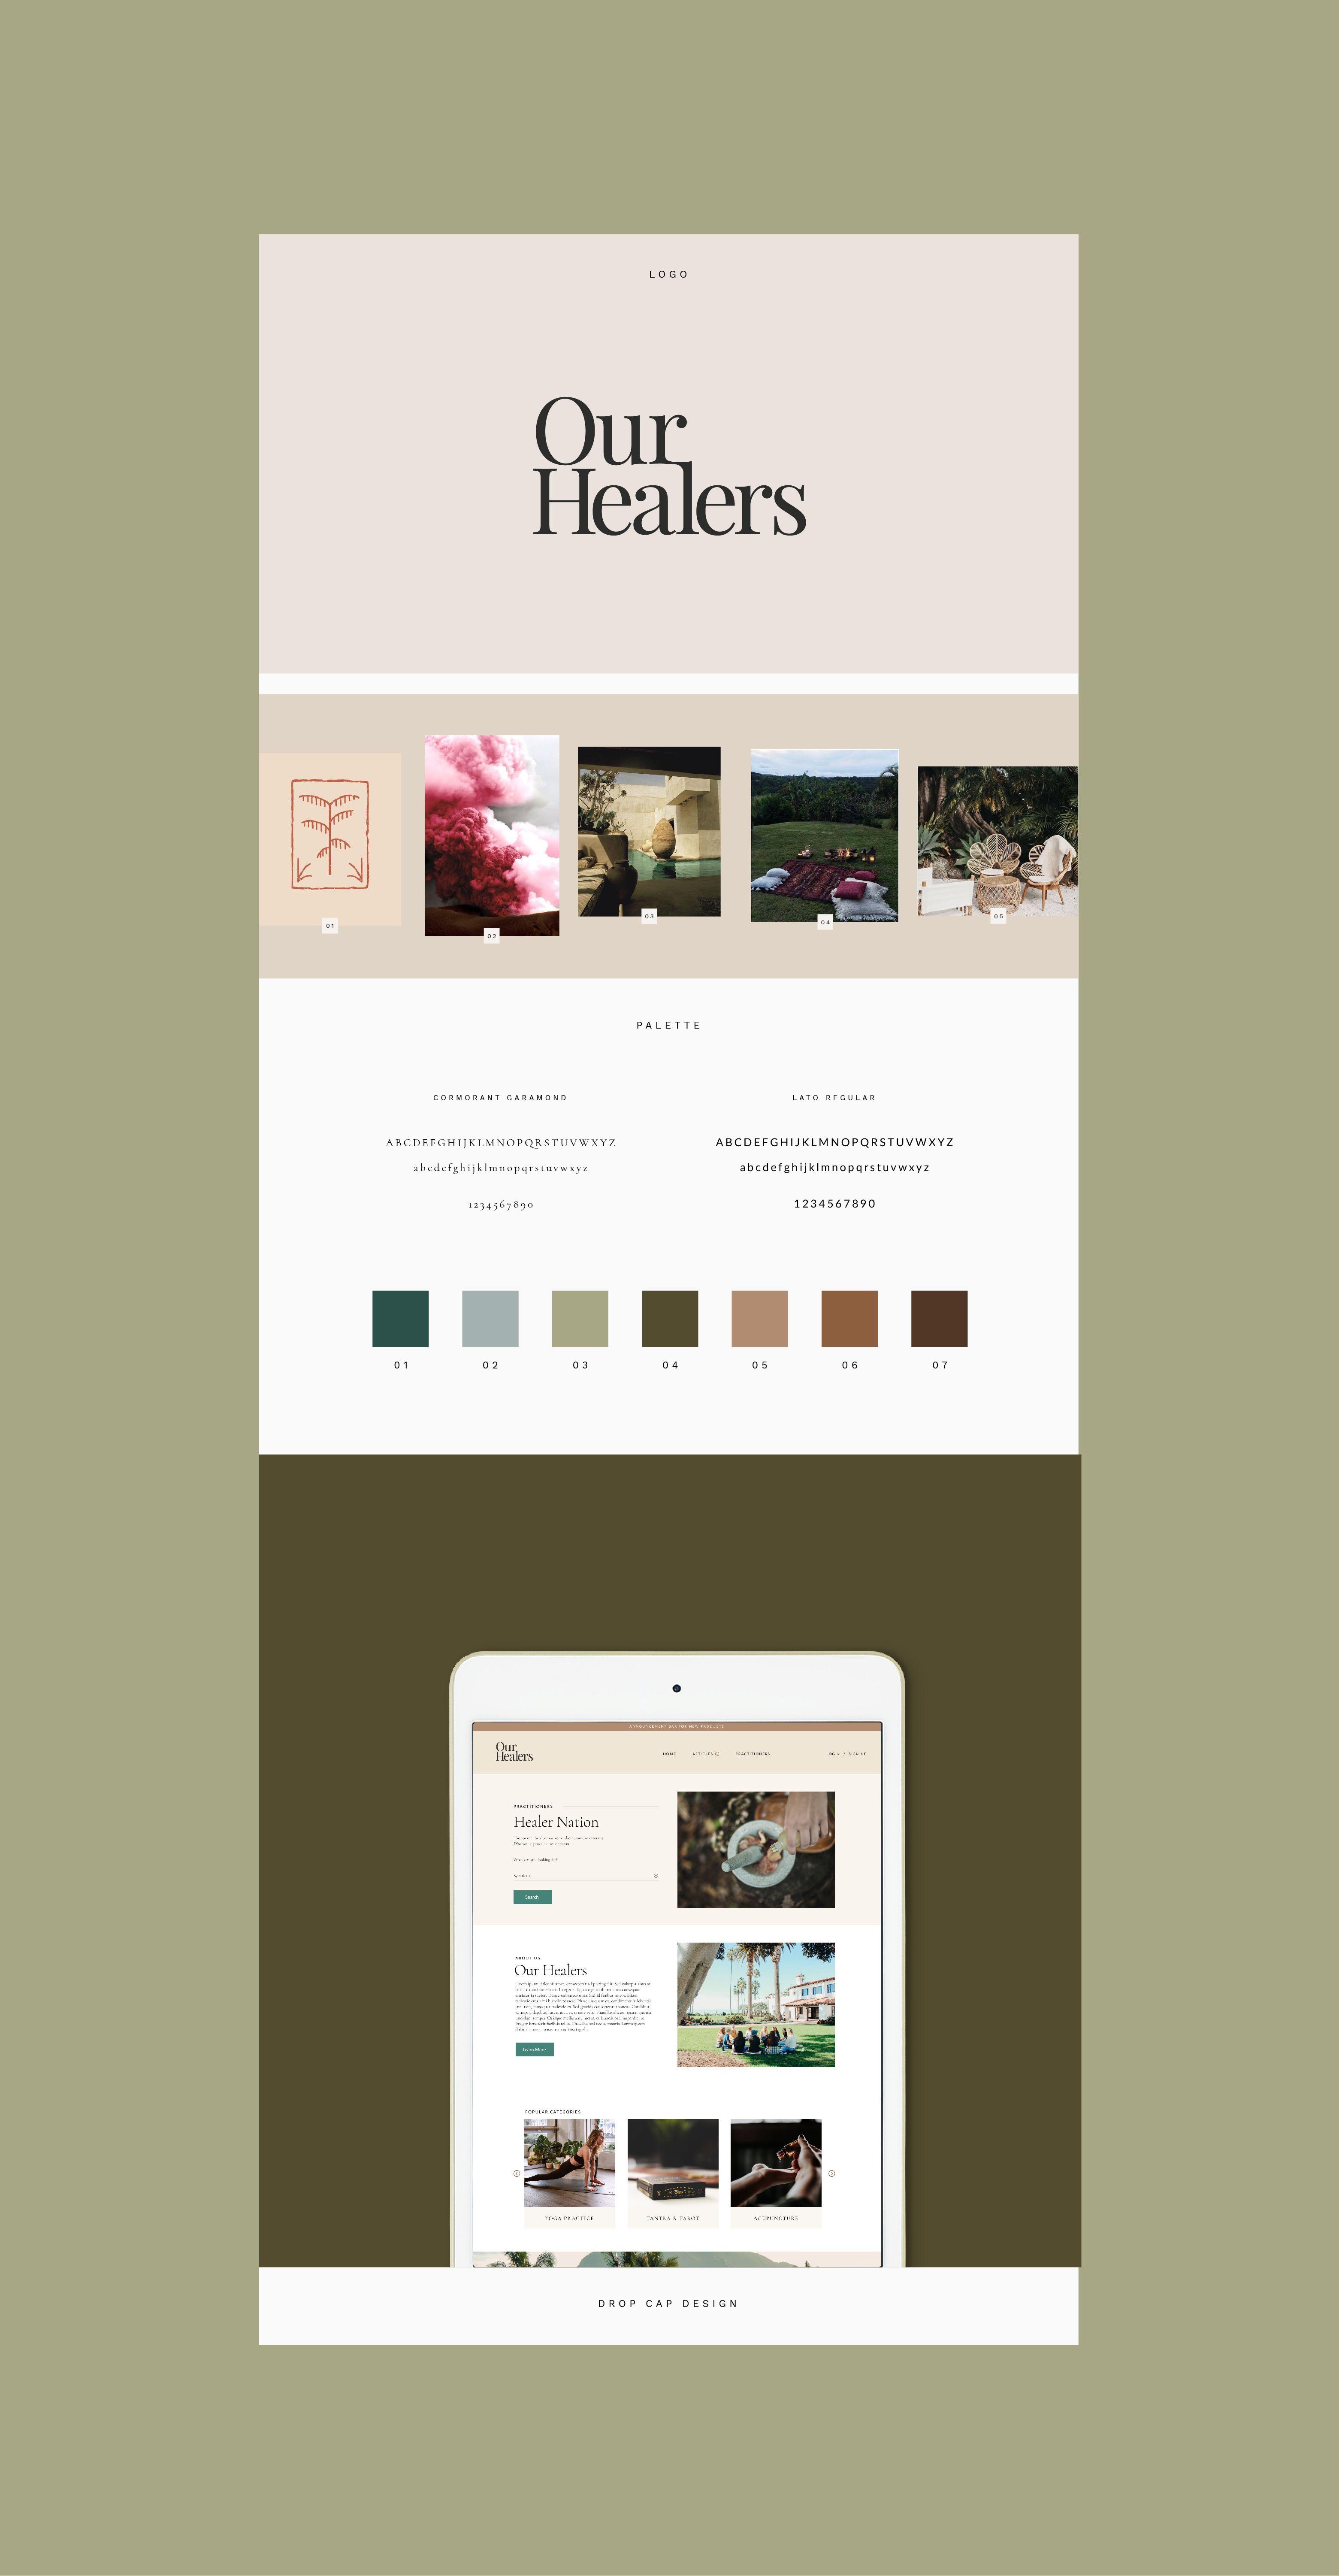 Our Healers Brand Design Branding Design Drop Cap Design Creative Entrepreneur Design